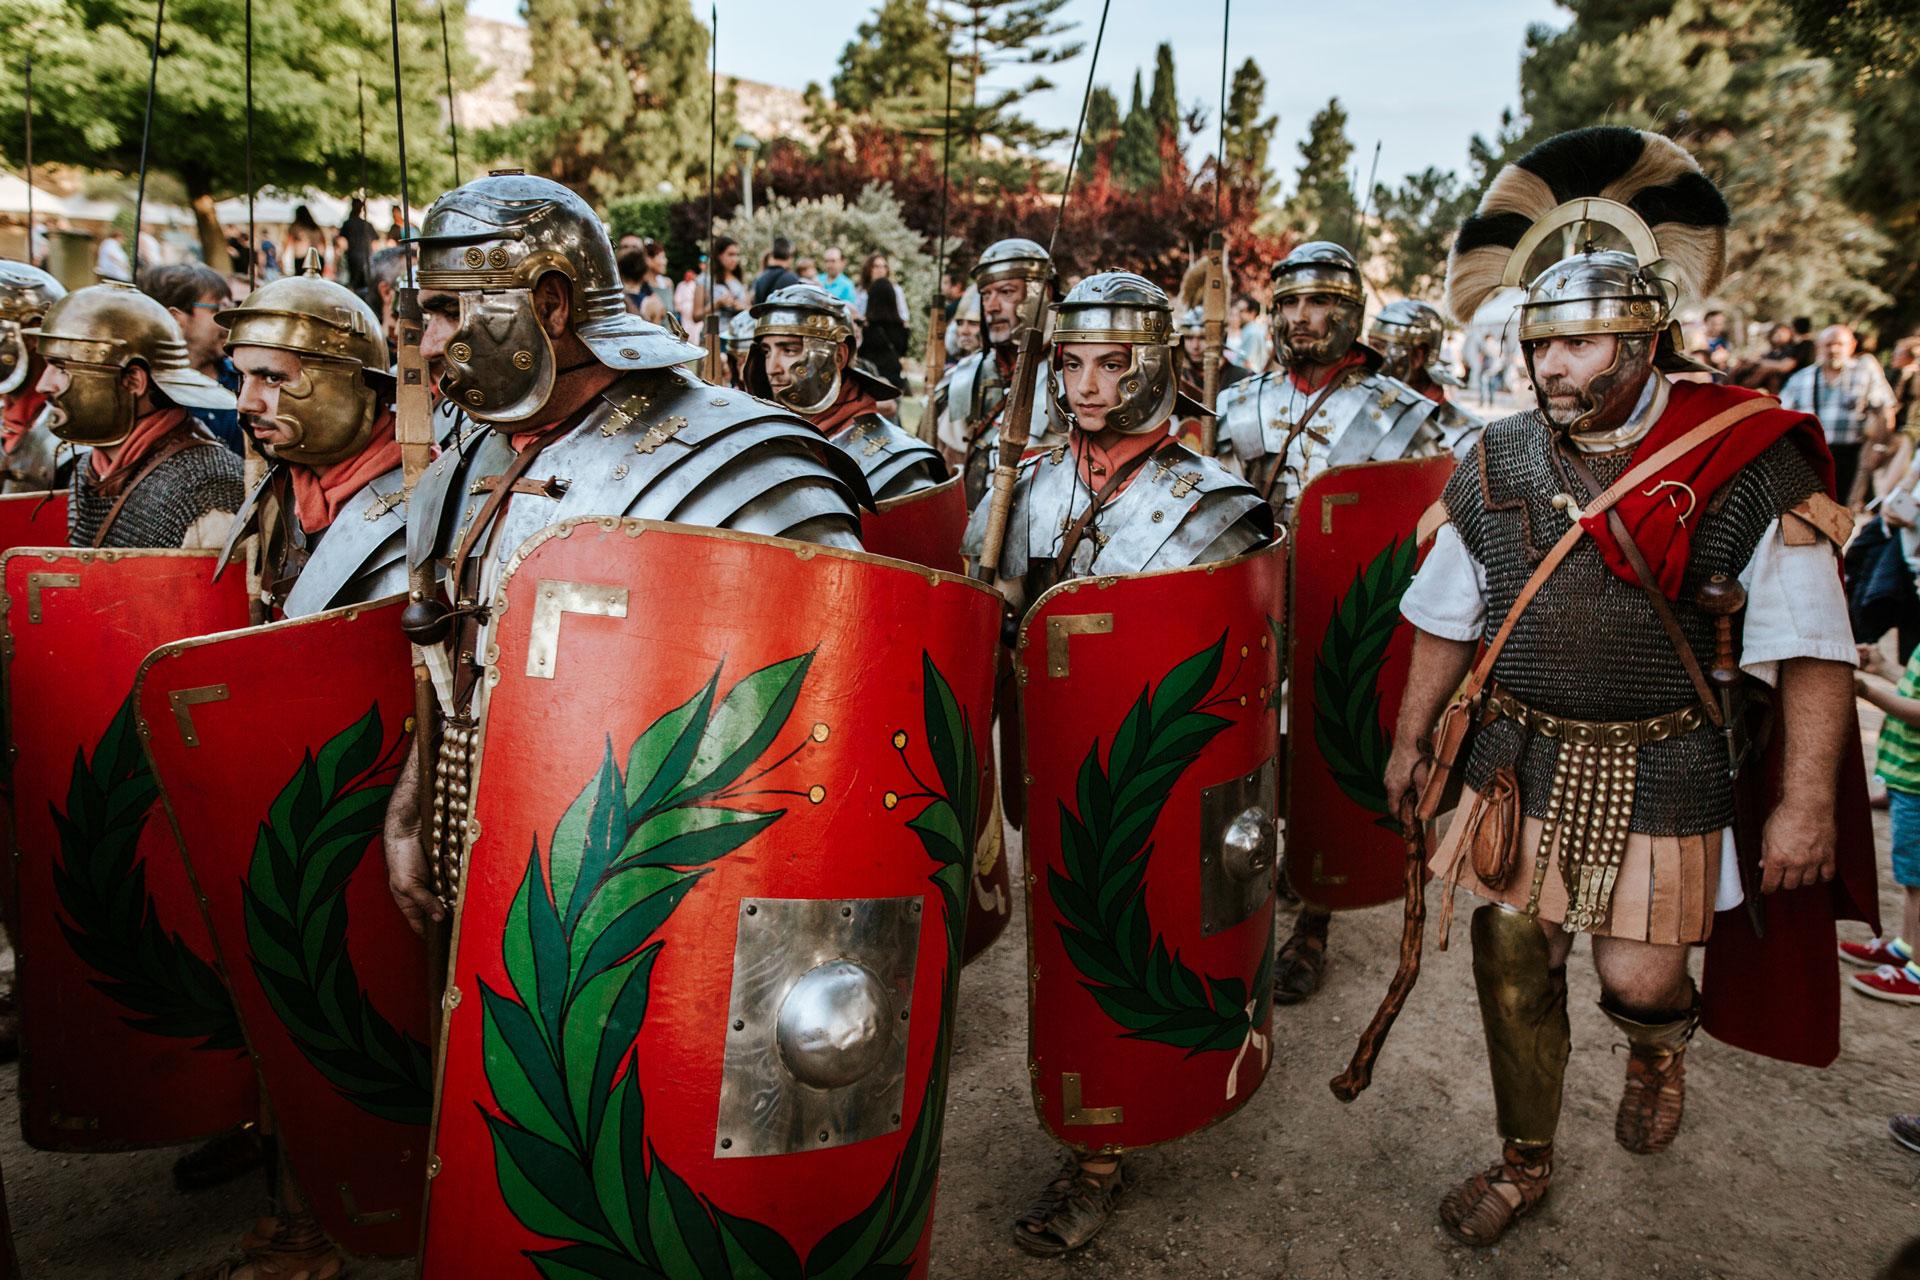 romans-festival-tarraco-viva-recreacio-historica-fotograf